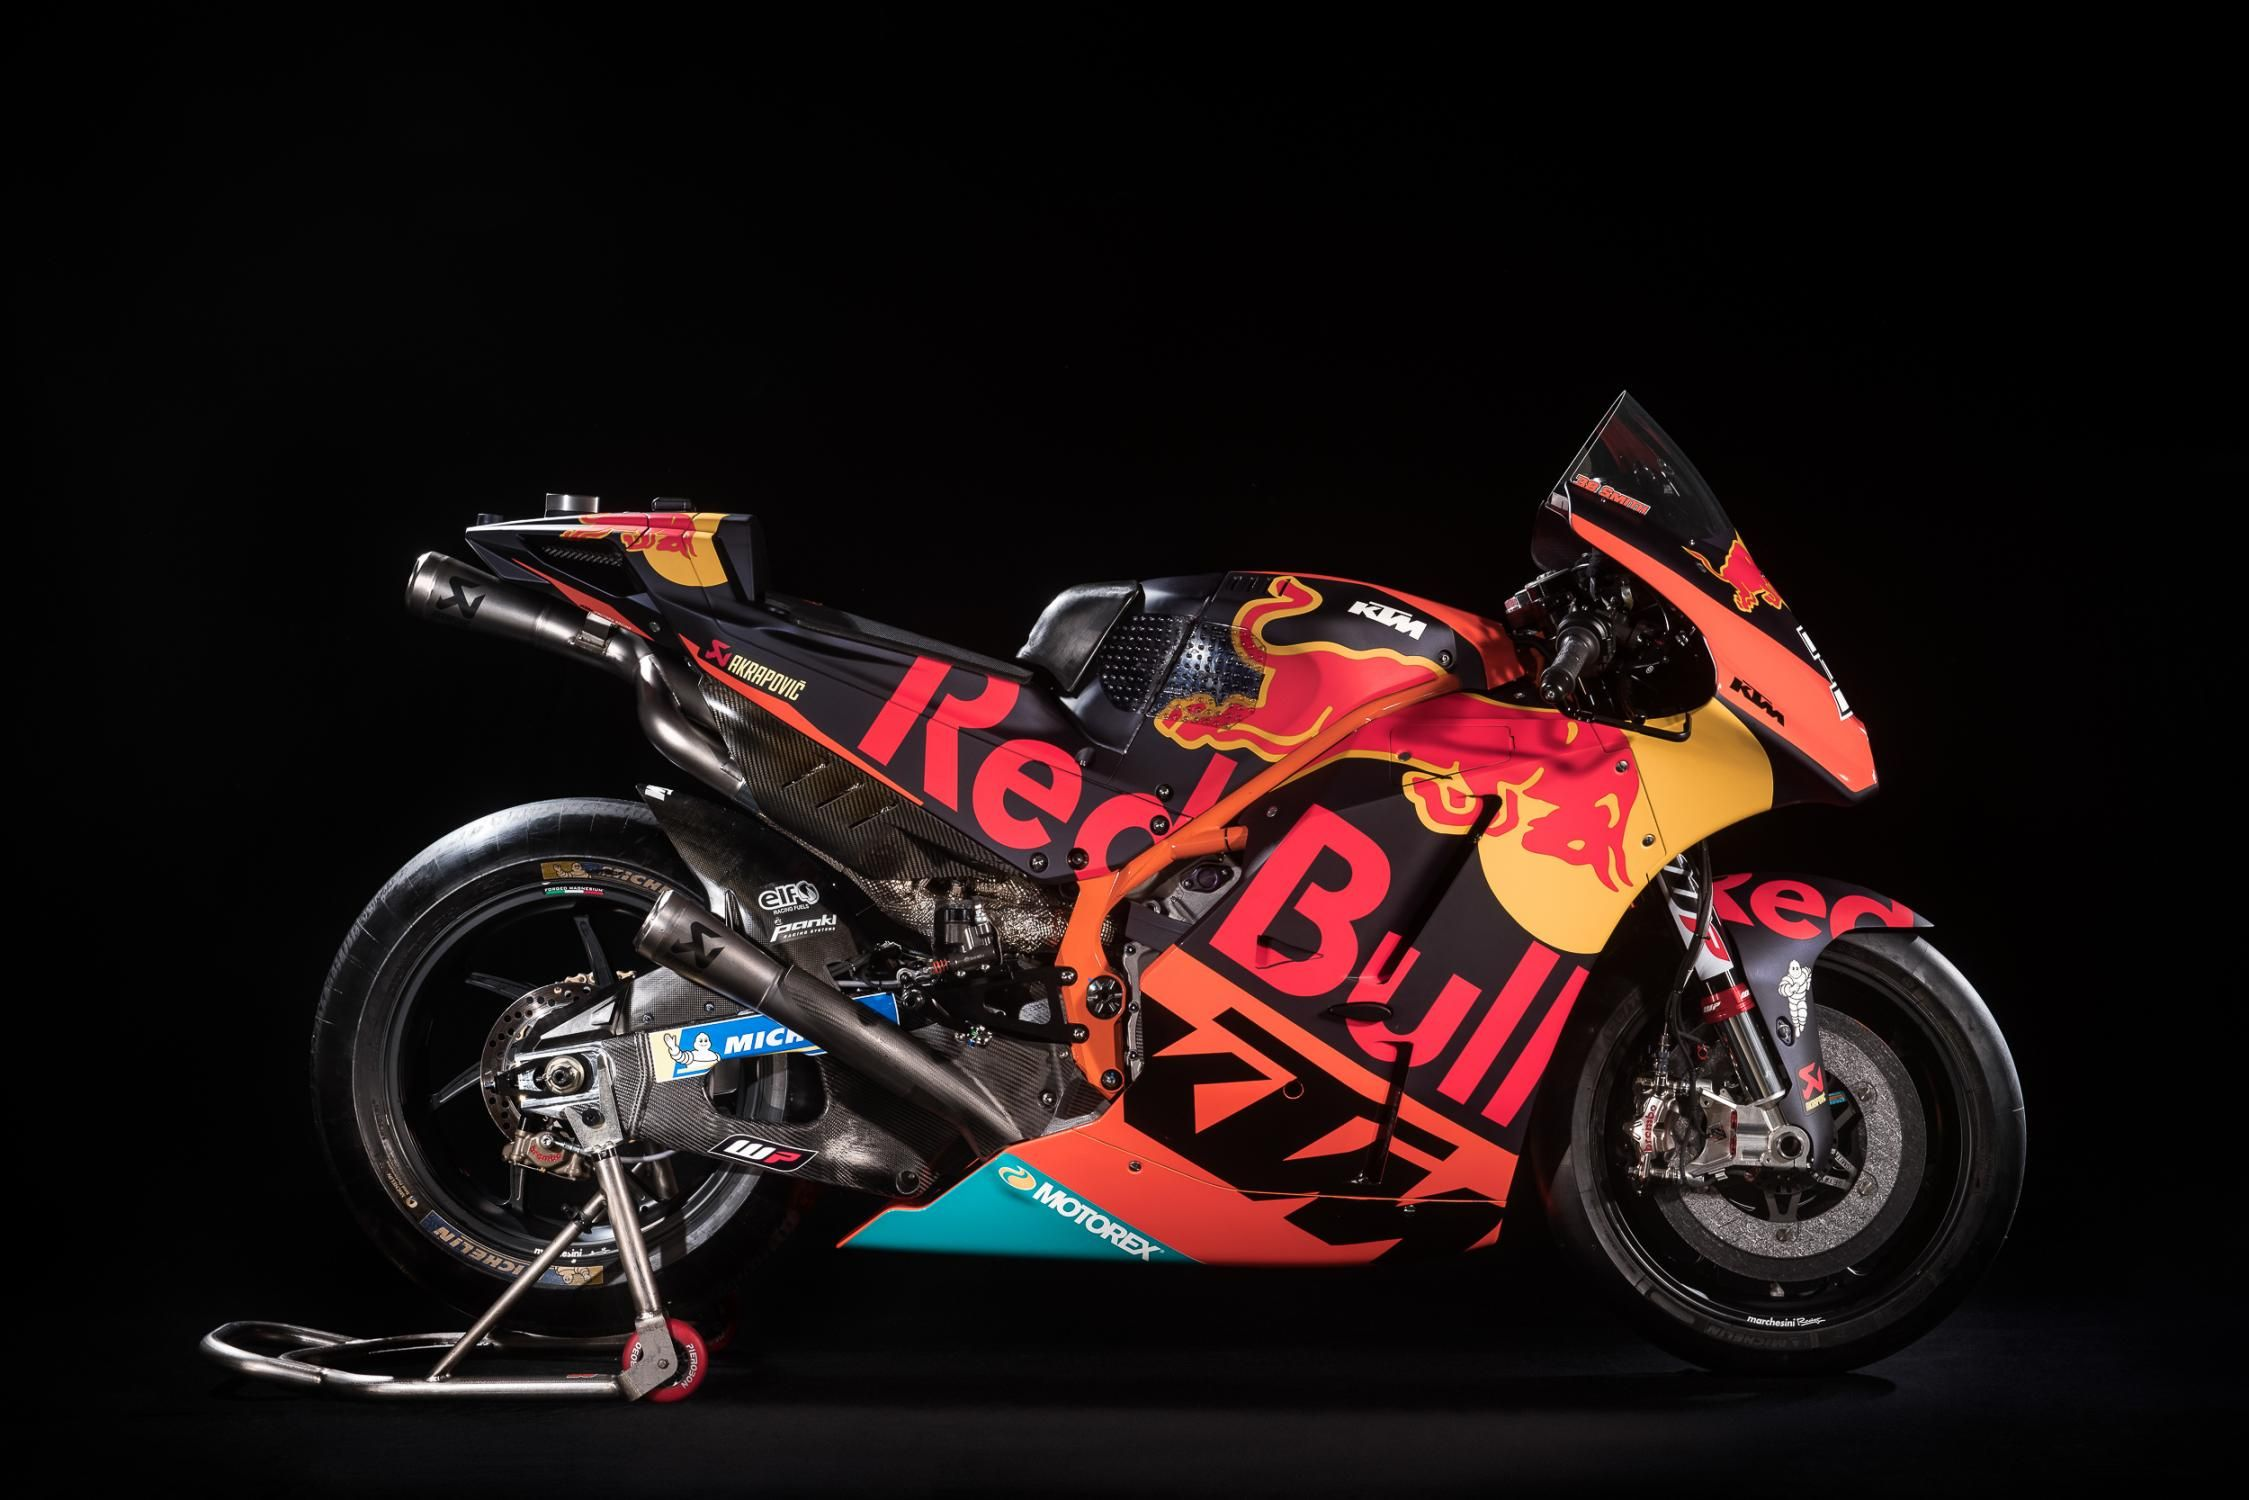 Ktm Rc16 2018 Right Side Ktm Racing Motorcycles Racing Bikes